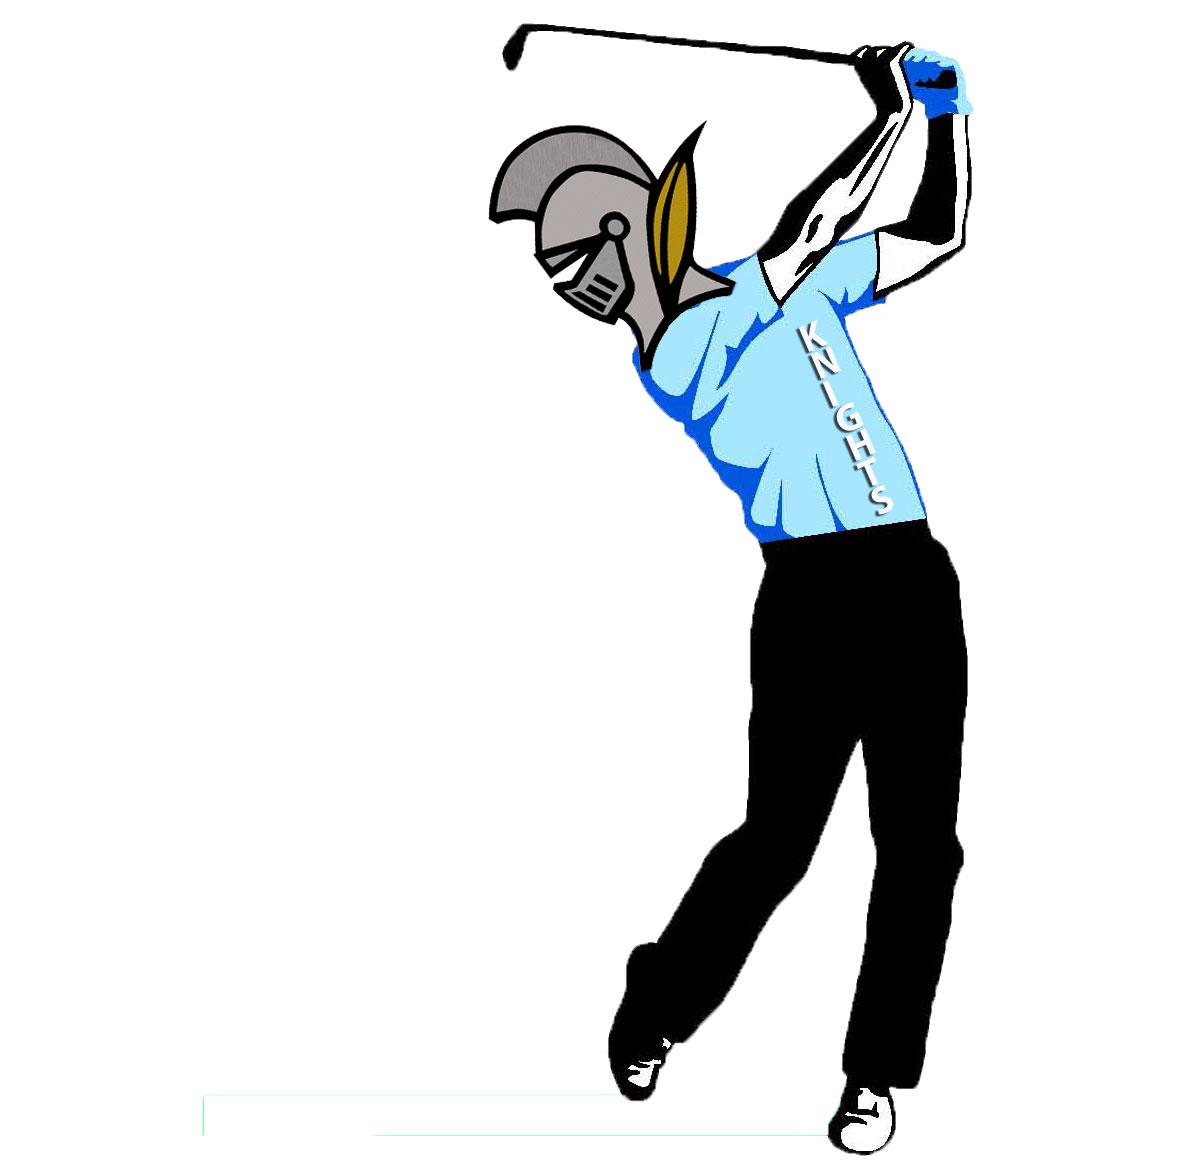 Golfer Image - ...